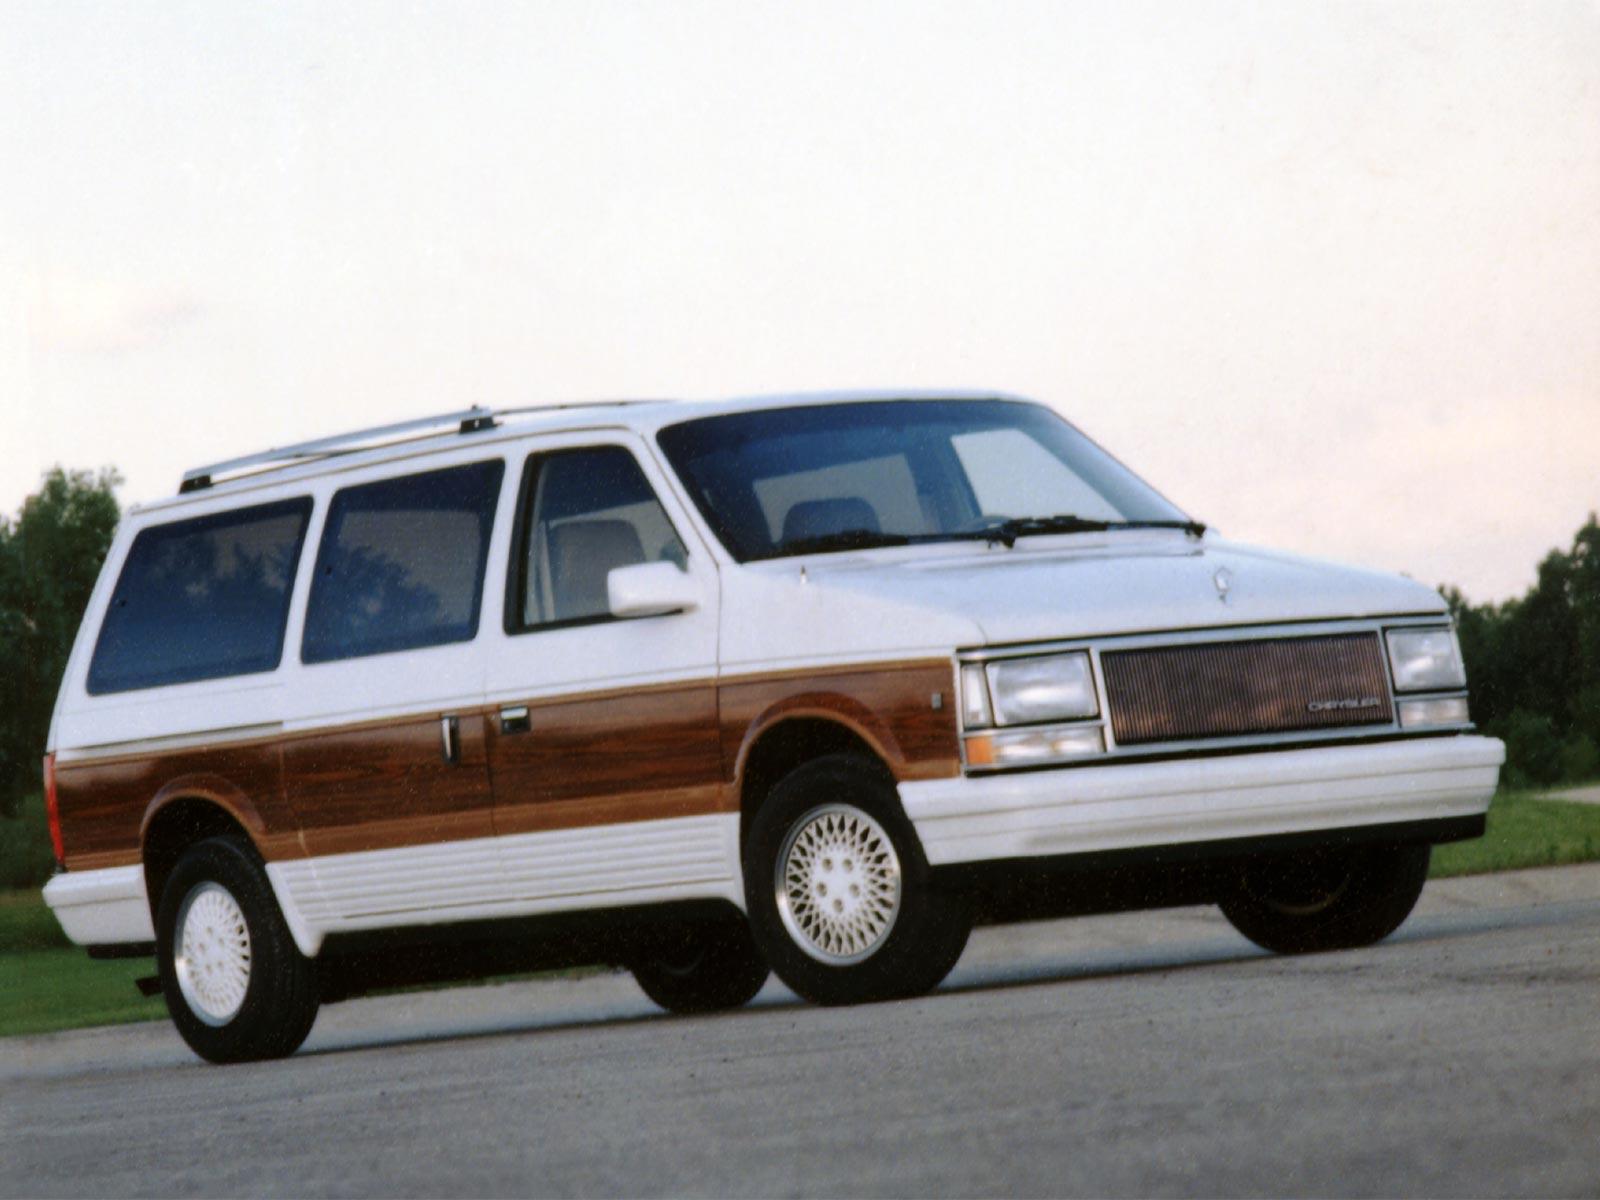 1989 1990 chrysler town country autoguru. Black Bedroom Furniture Sets. Home Design Ideas